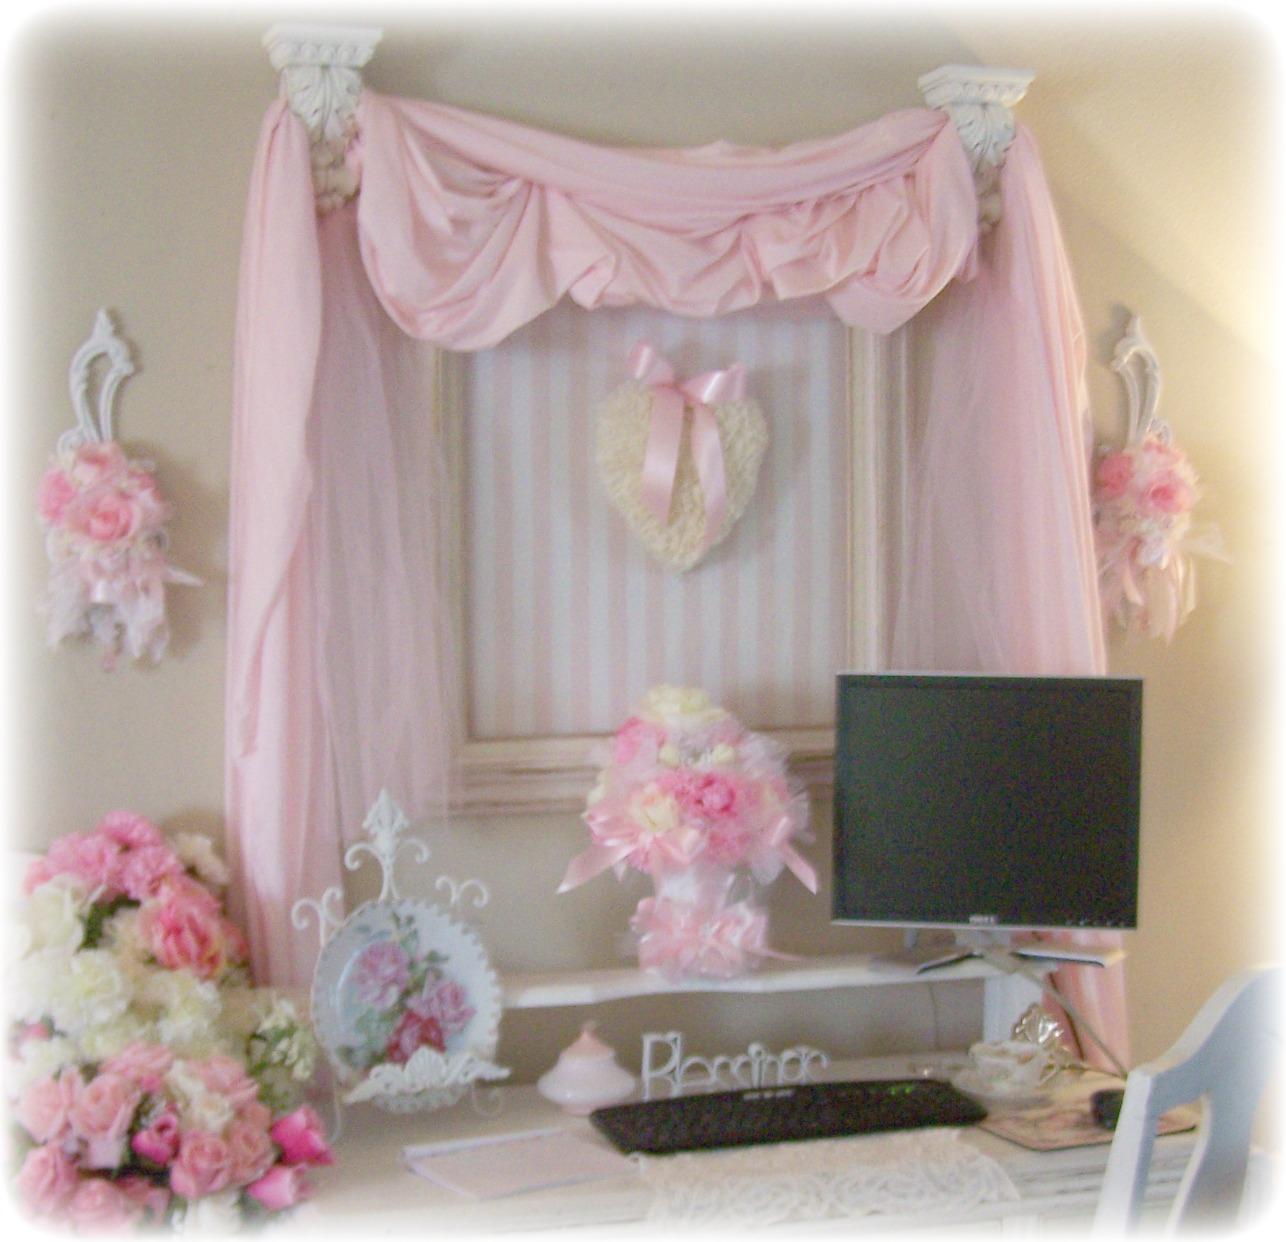 Olivia's Romantic Home: Shabby Chic Office